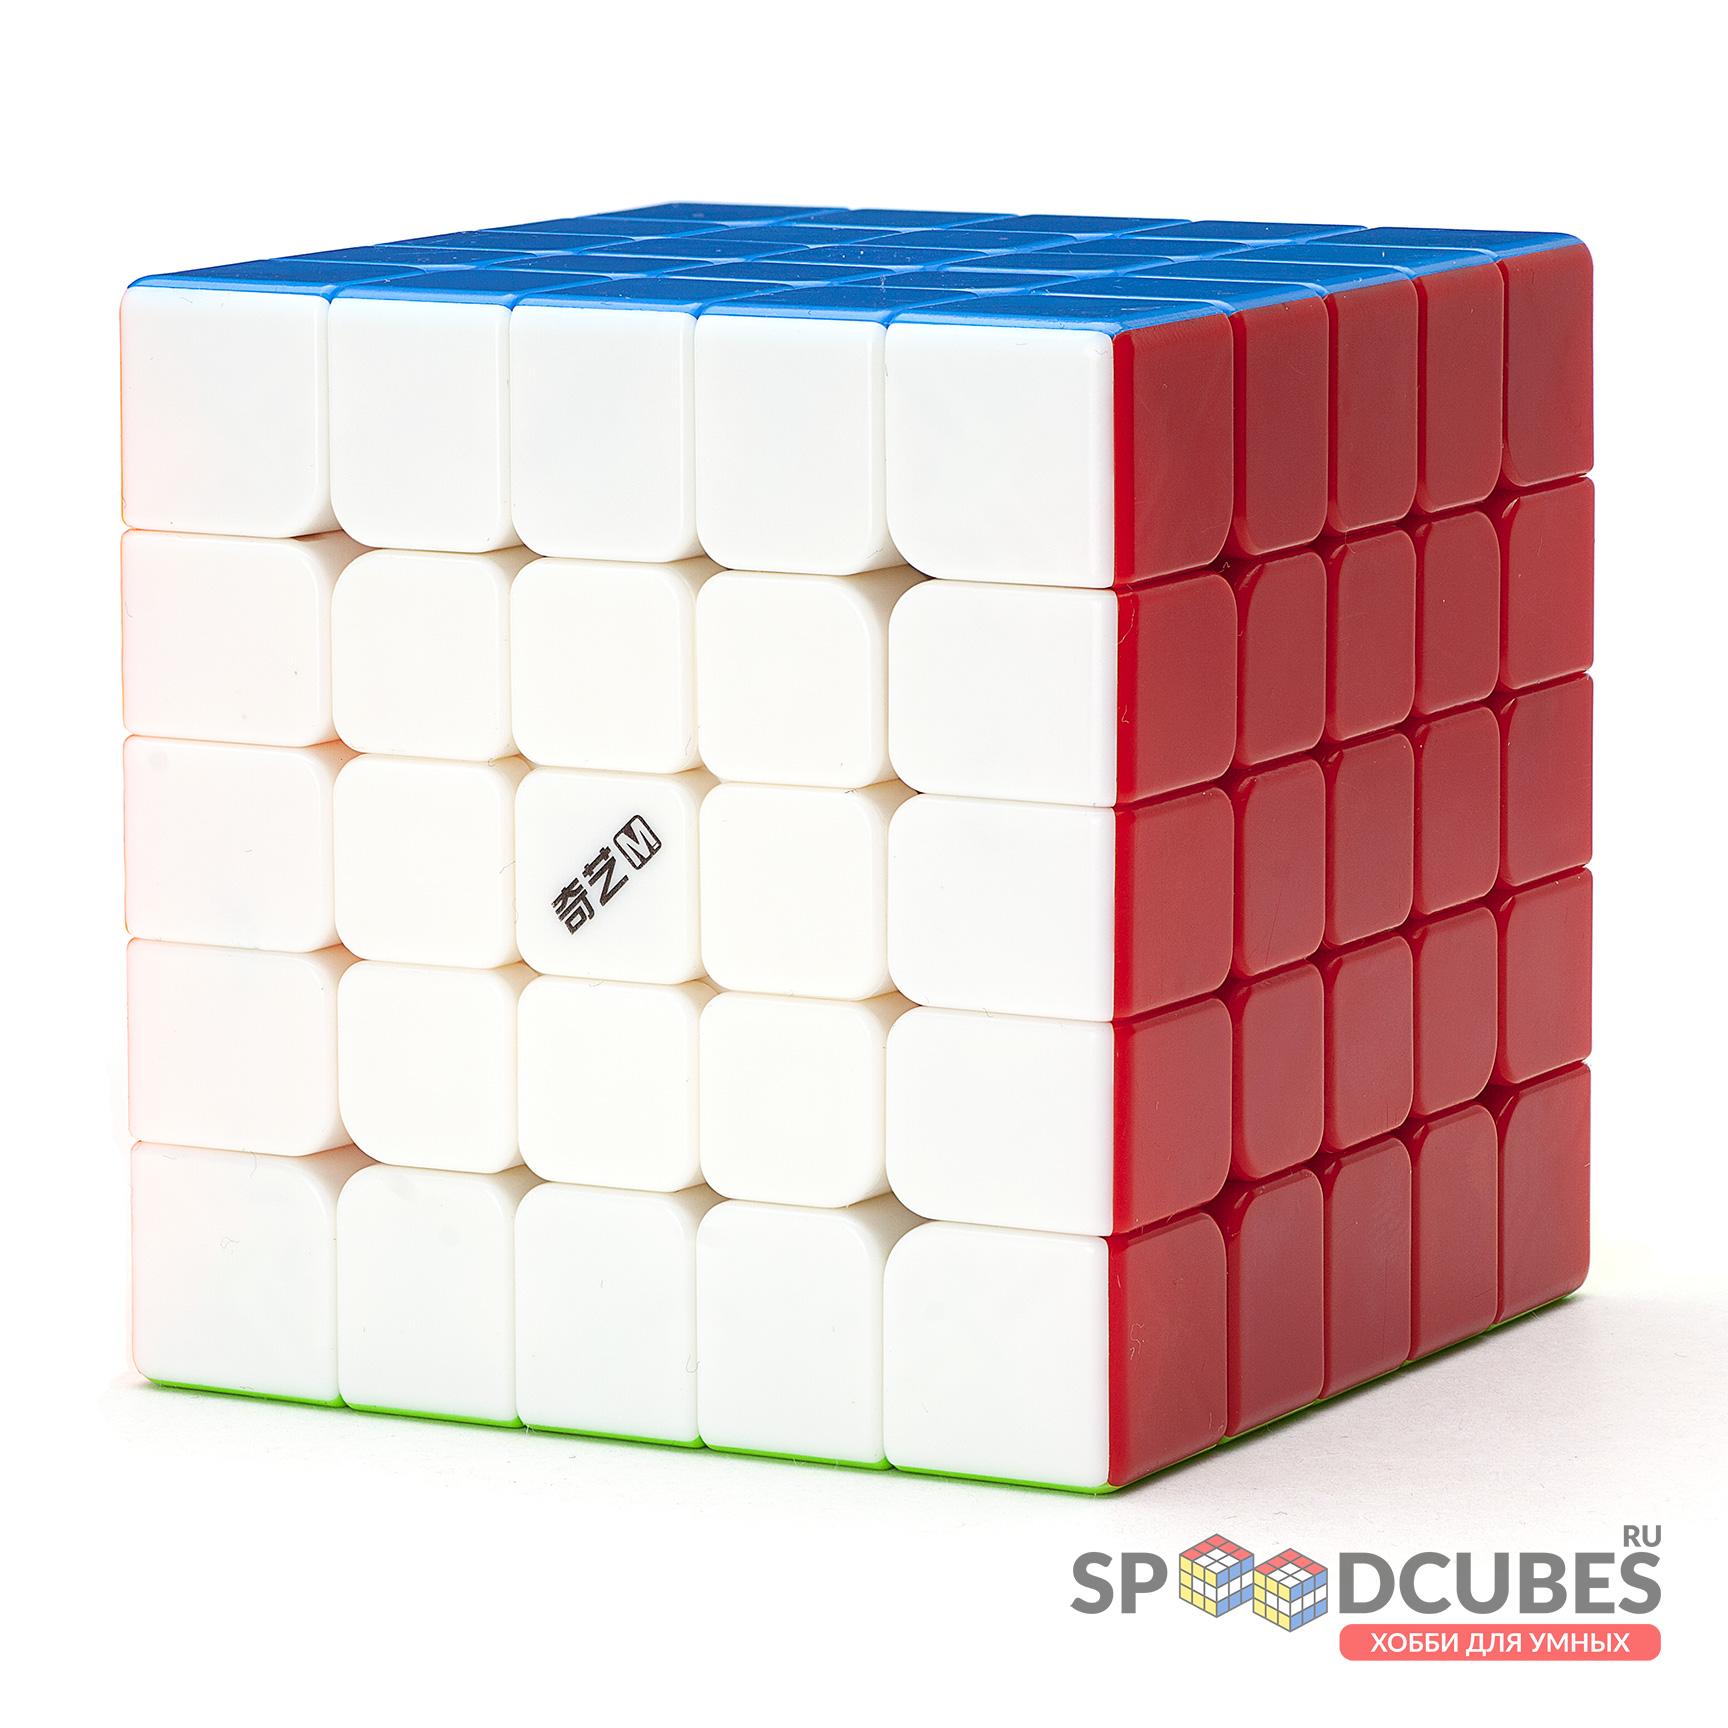 QiYi (MoFangGe) MS 5x5x5 Magnetic